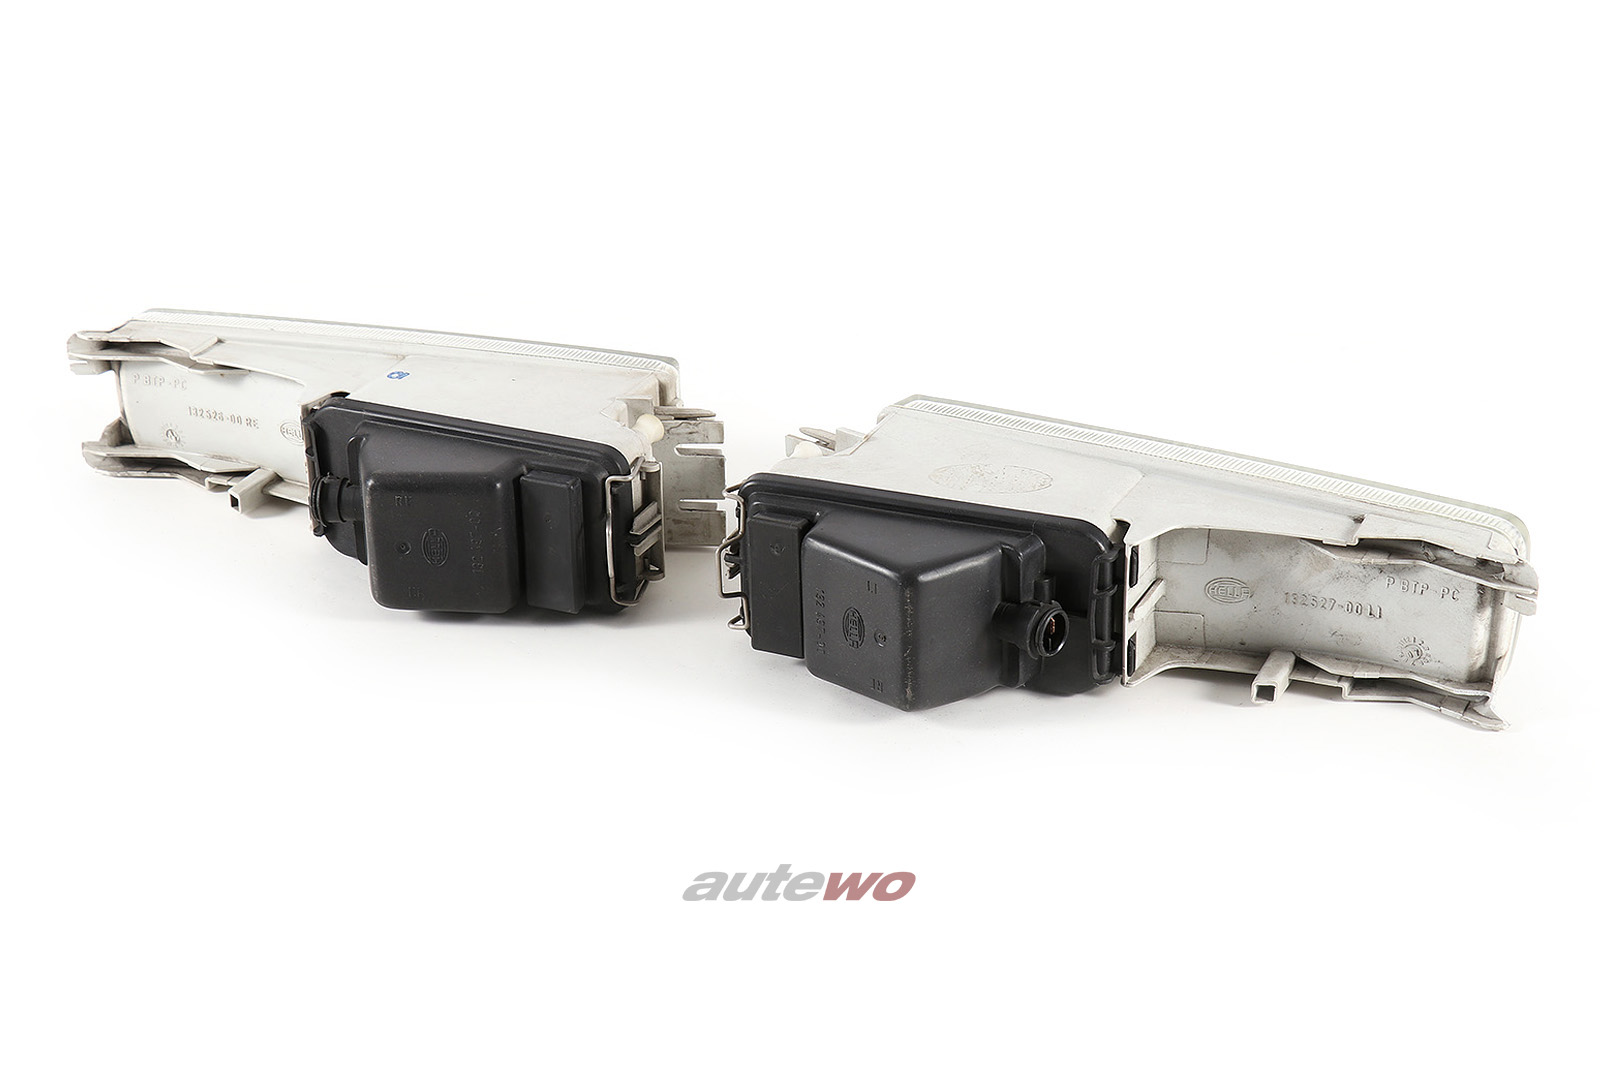 8A0941699/8A0941700 Audi 80 B4/S2 Coupe/Cabrio Typ 89 Nebelscheinwerfer Paar